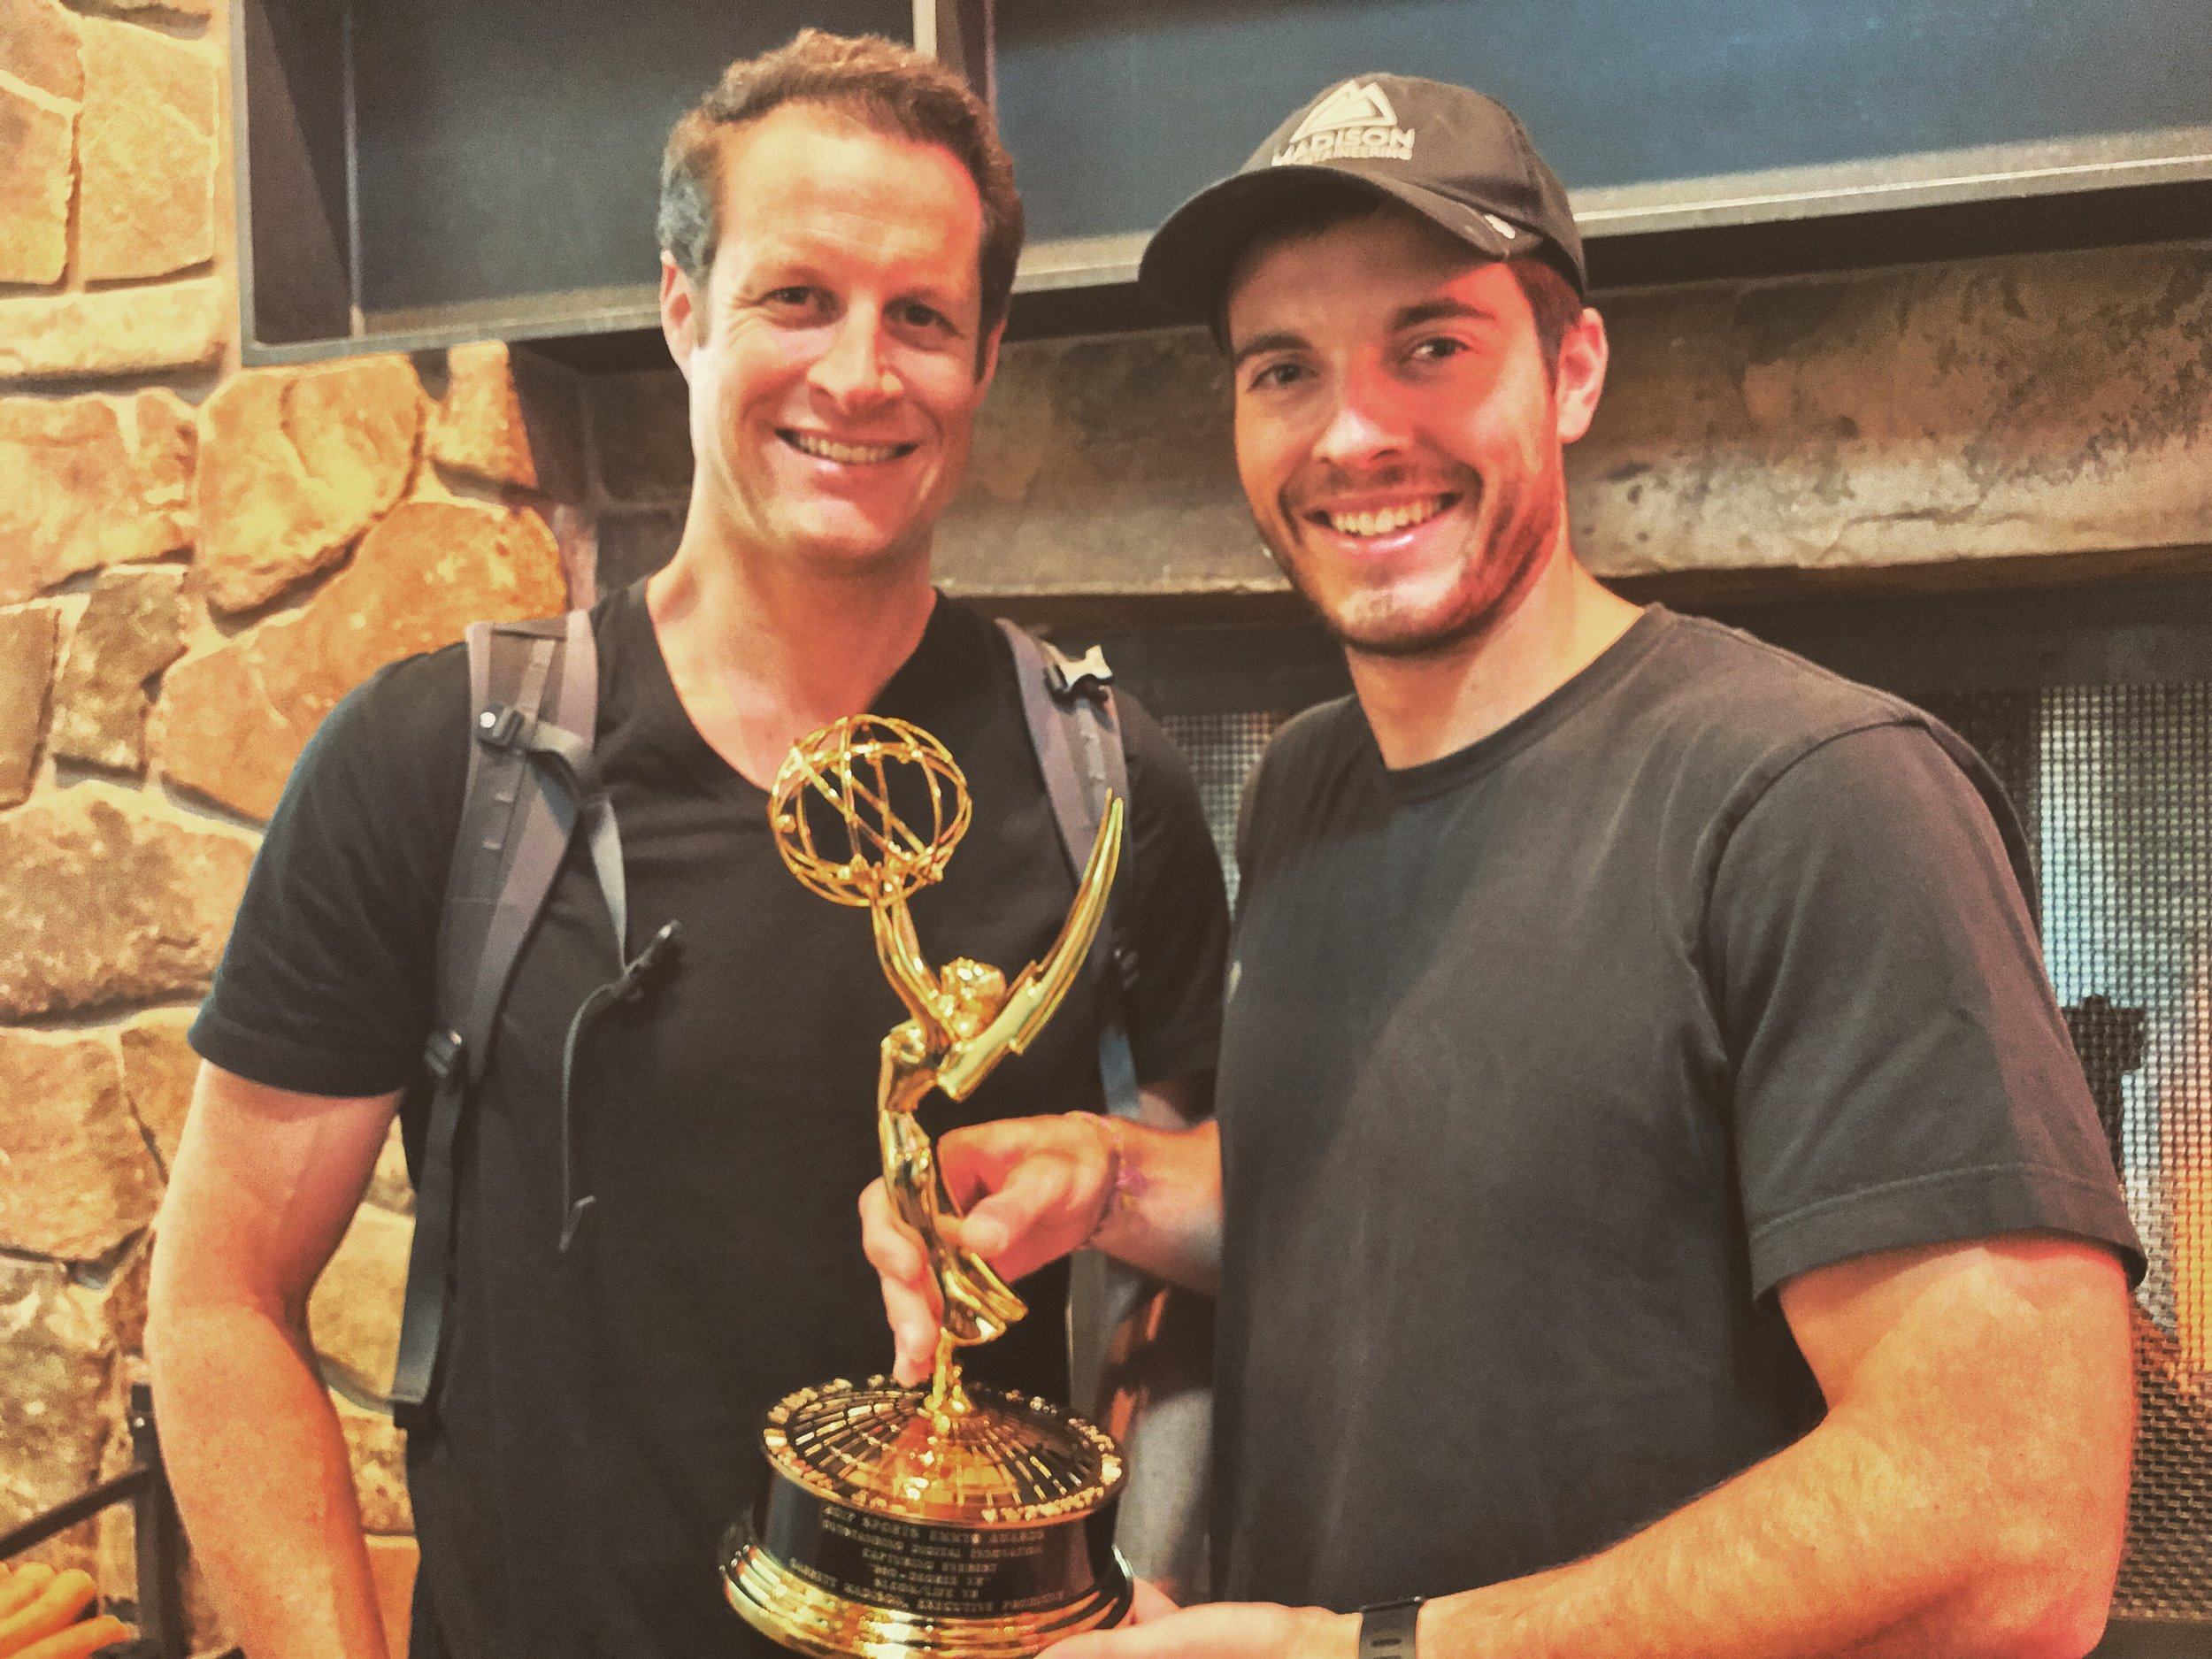 Digital Innovation Emmy Award Winner - CAPTURING EVEREST VIRTUAL REALITY